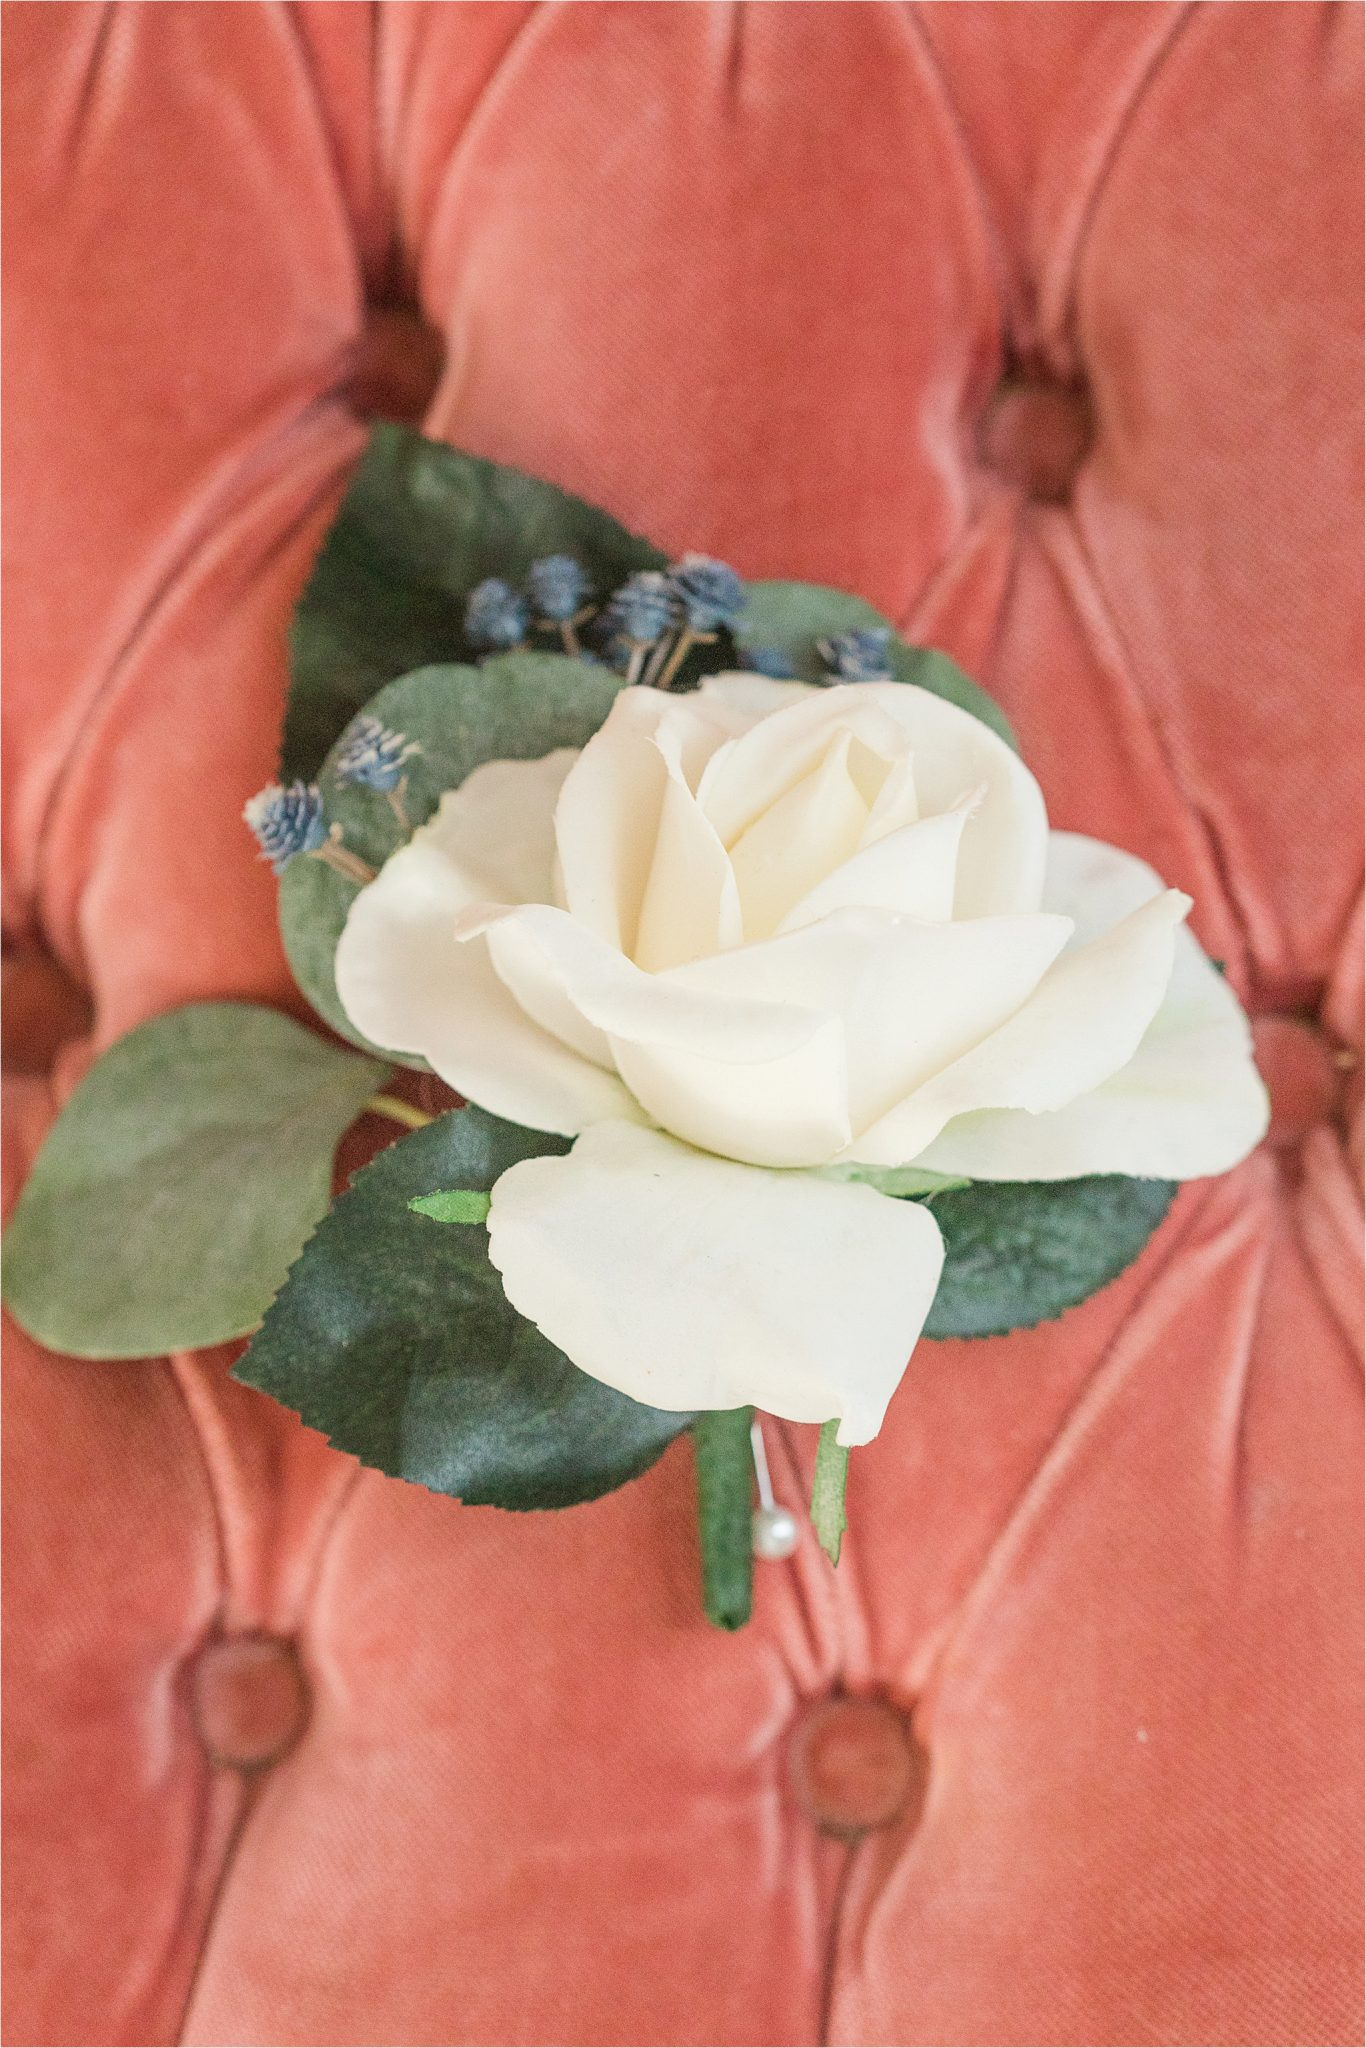 realistic-arificial-flowers-white-rose-corsage-wedding-periwinkle-raspberry-terra cotta